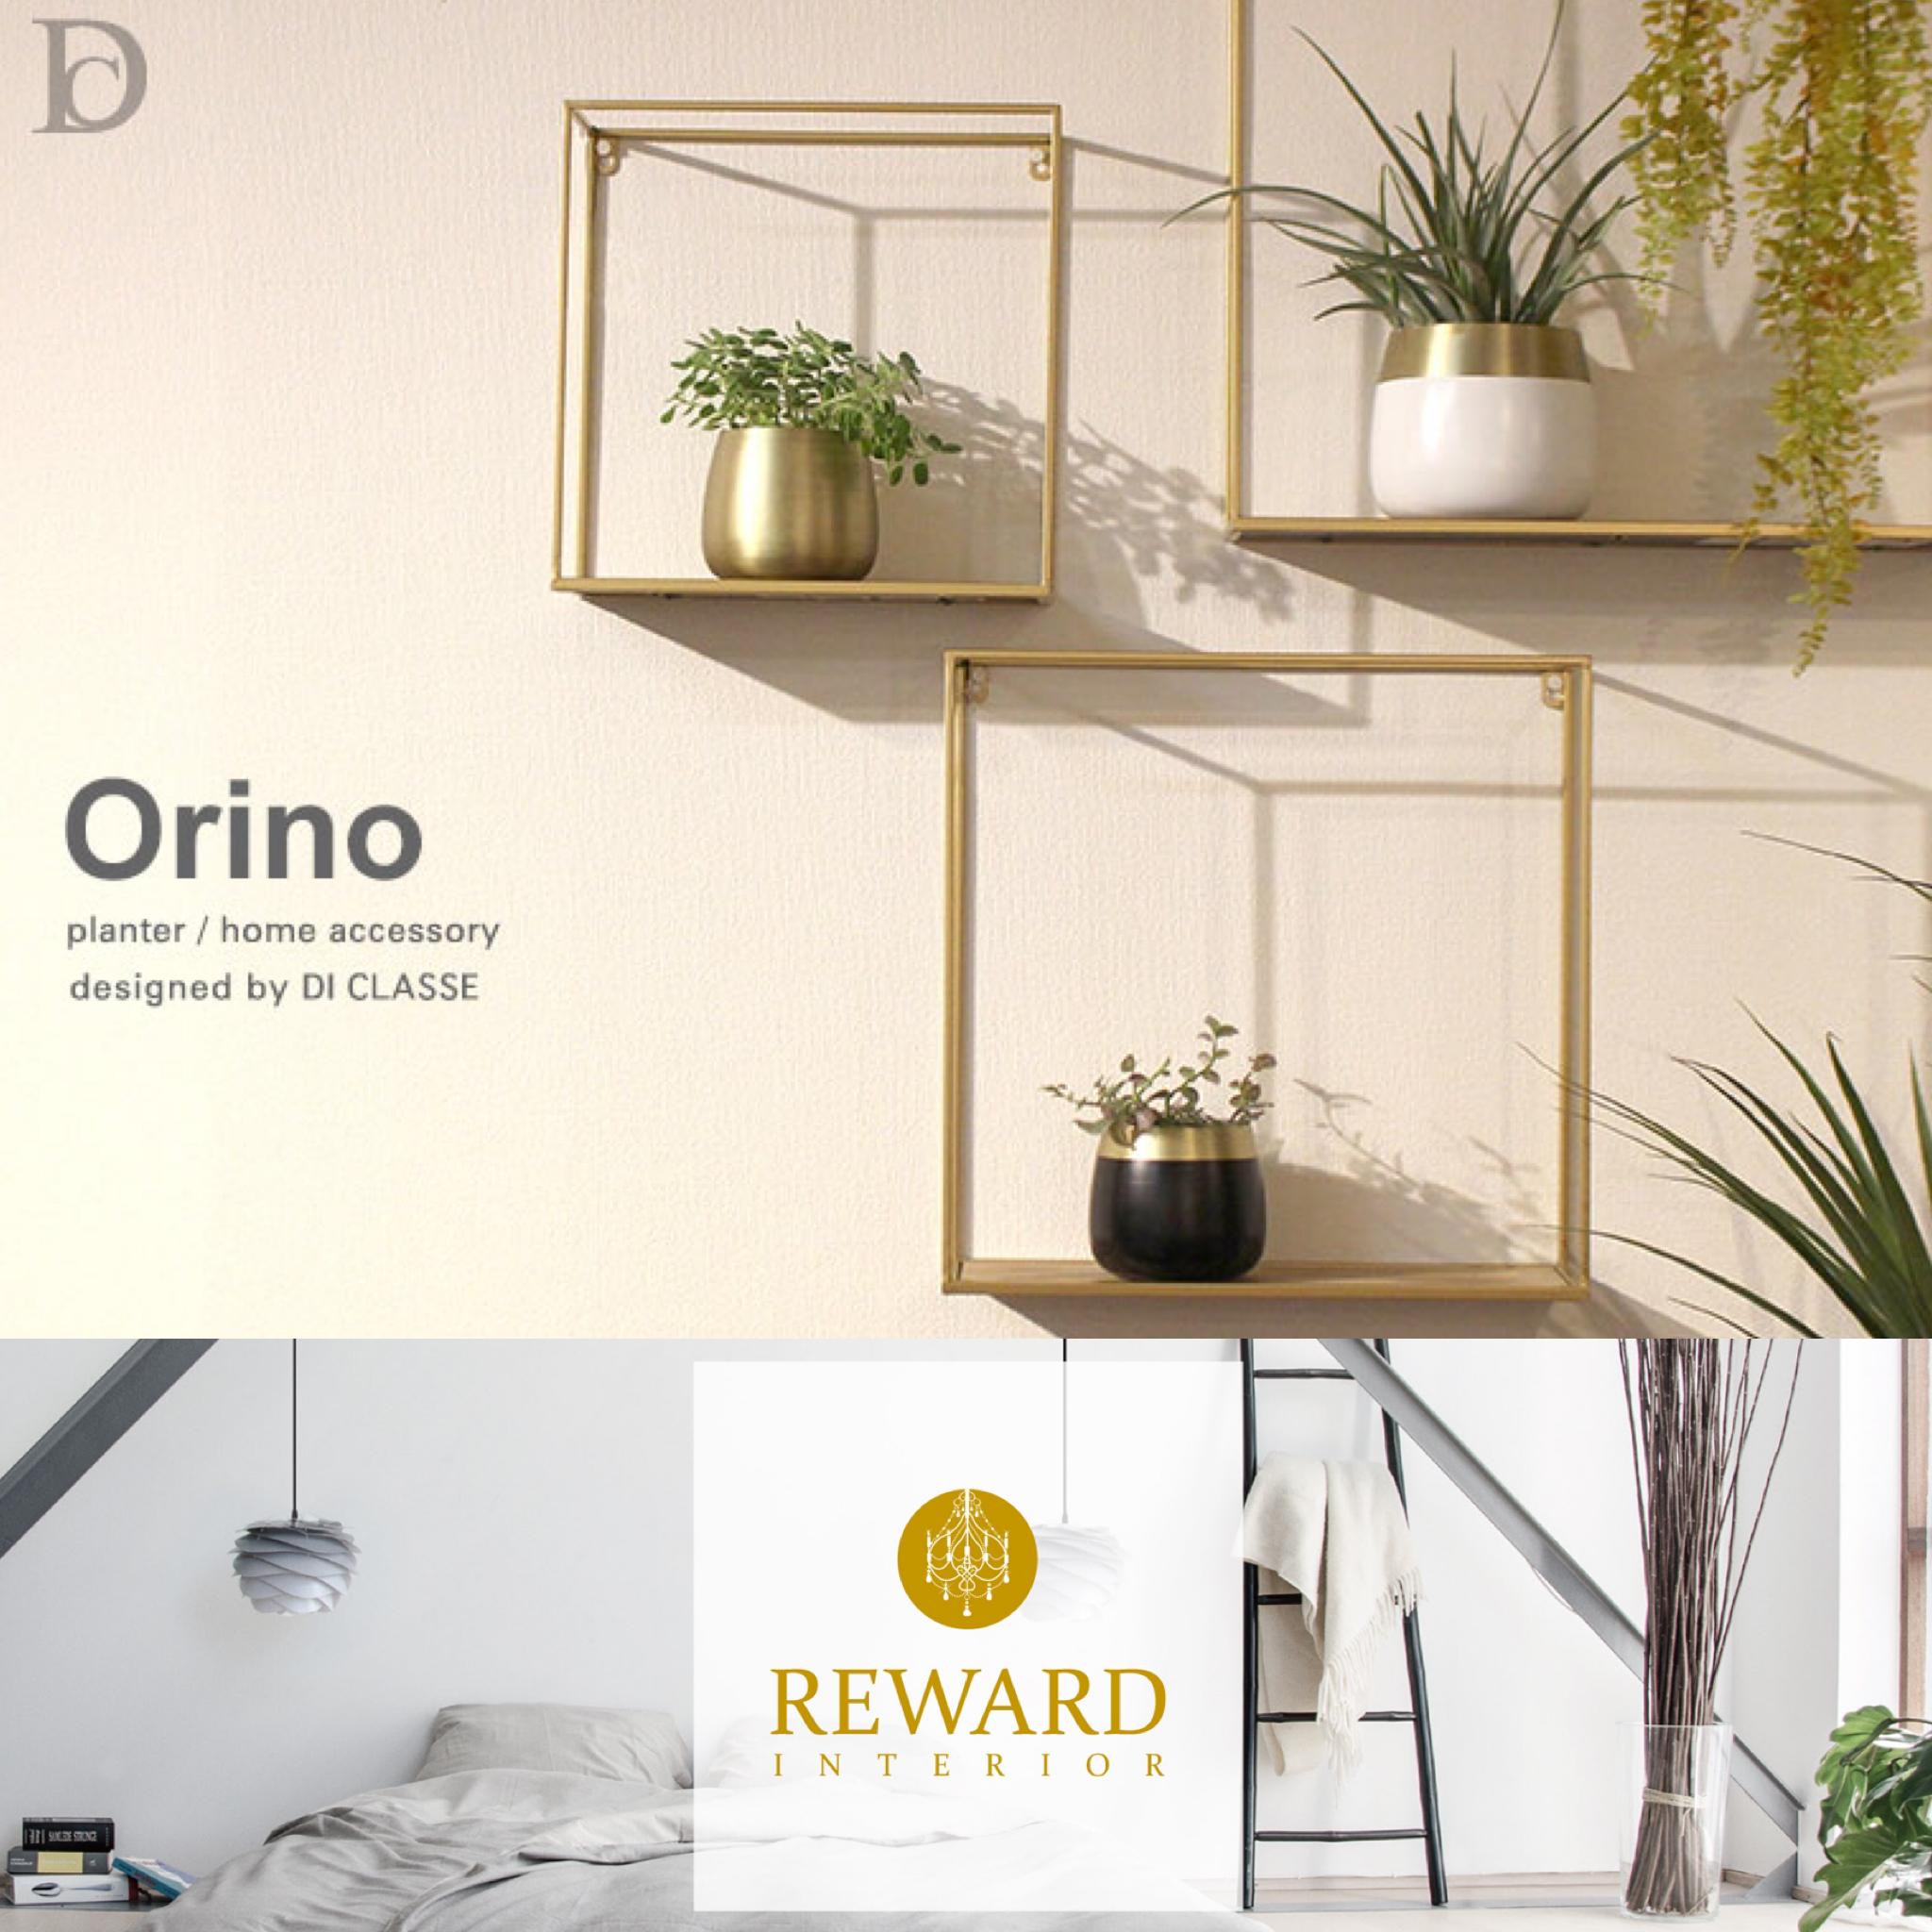 Orino planter Sサイズ オリノ プランター 植木鉢 DI-CLASSE 雑貨 全3色